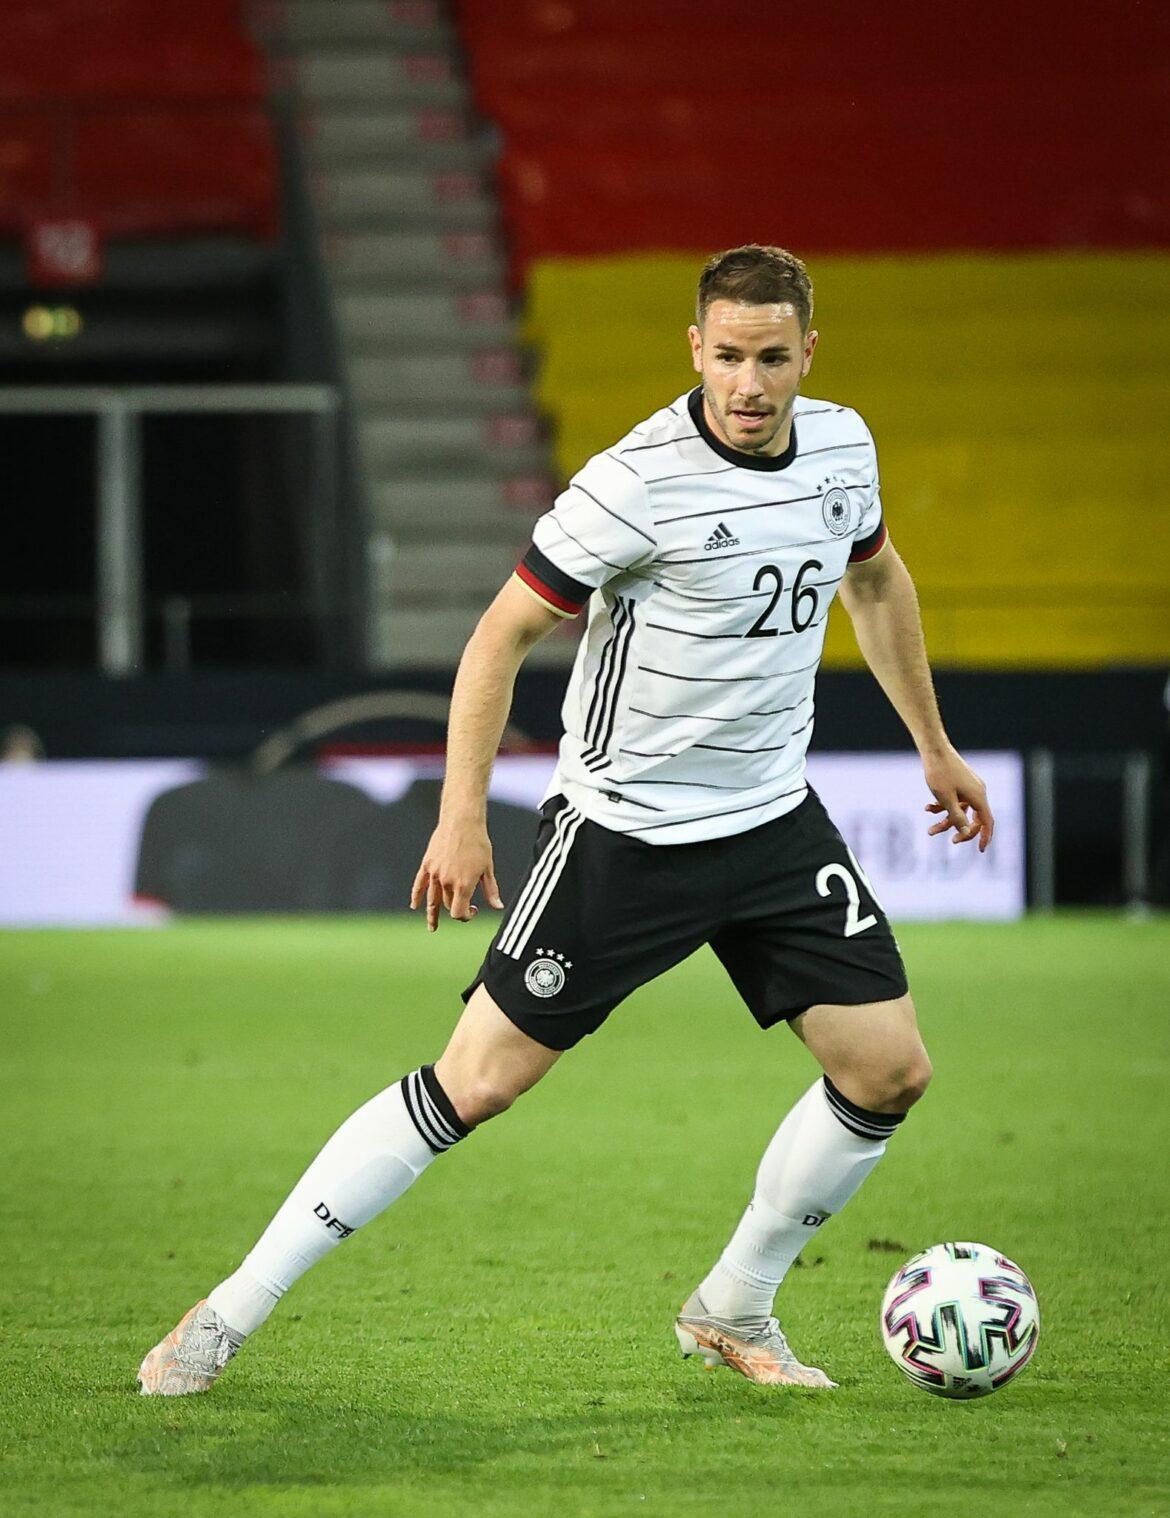 Nationalspieler Günter verteidigt Löws EM-Taktik